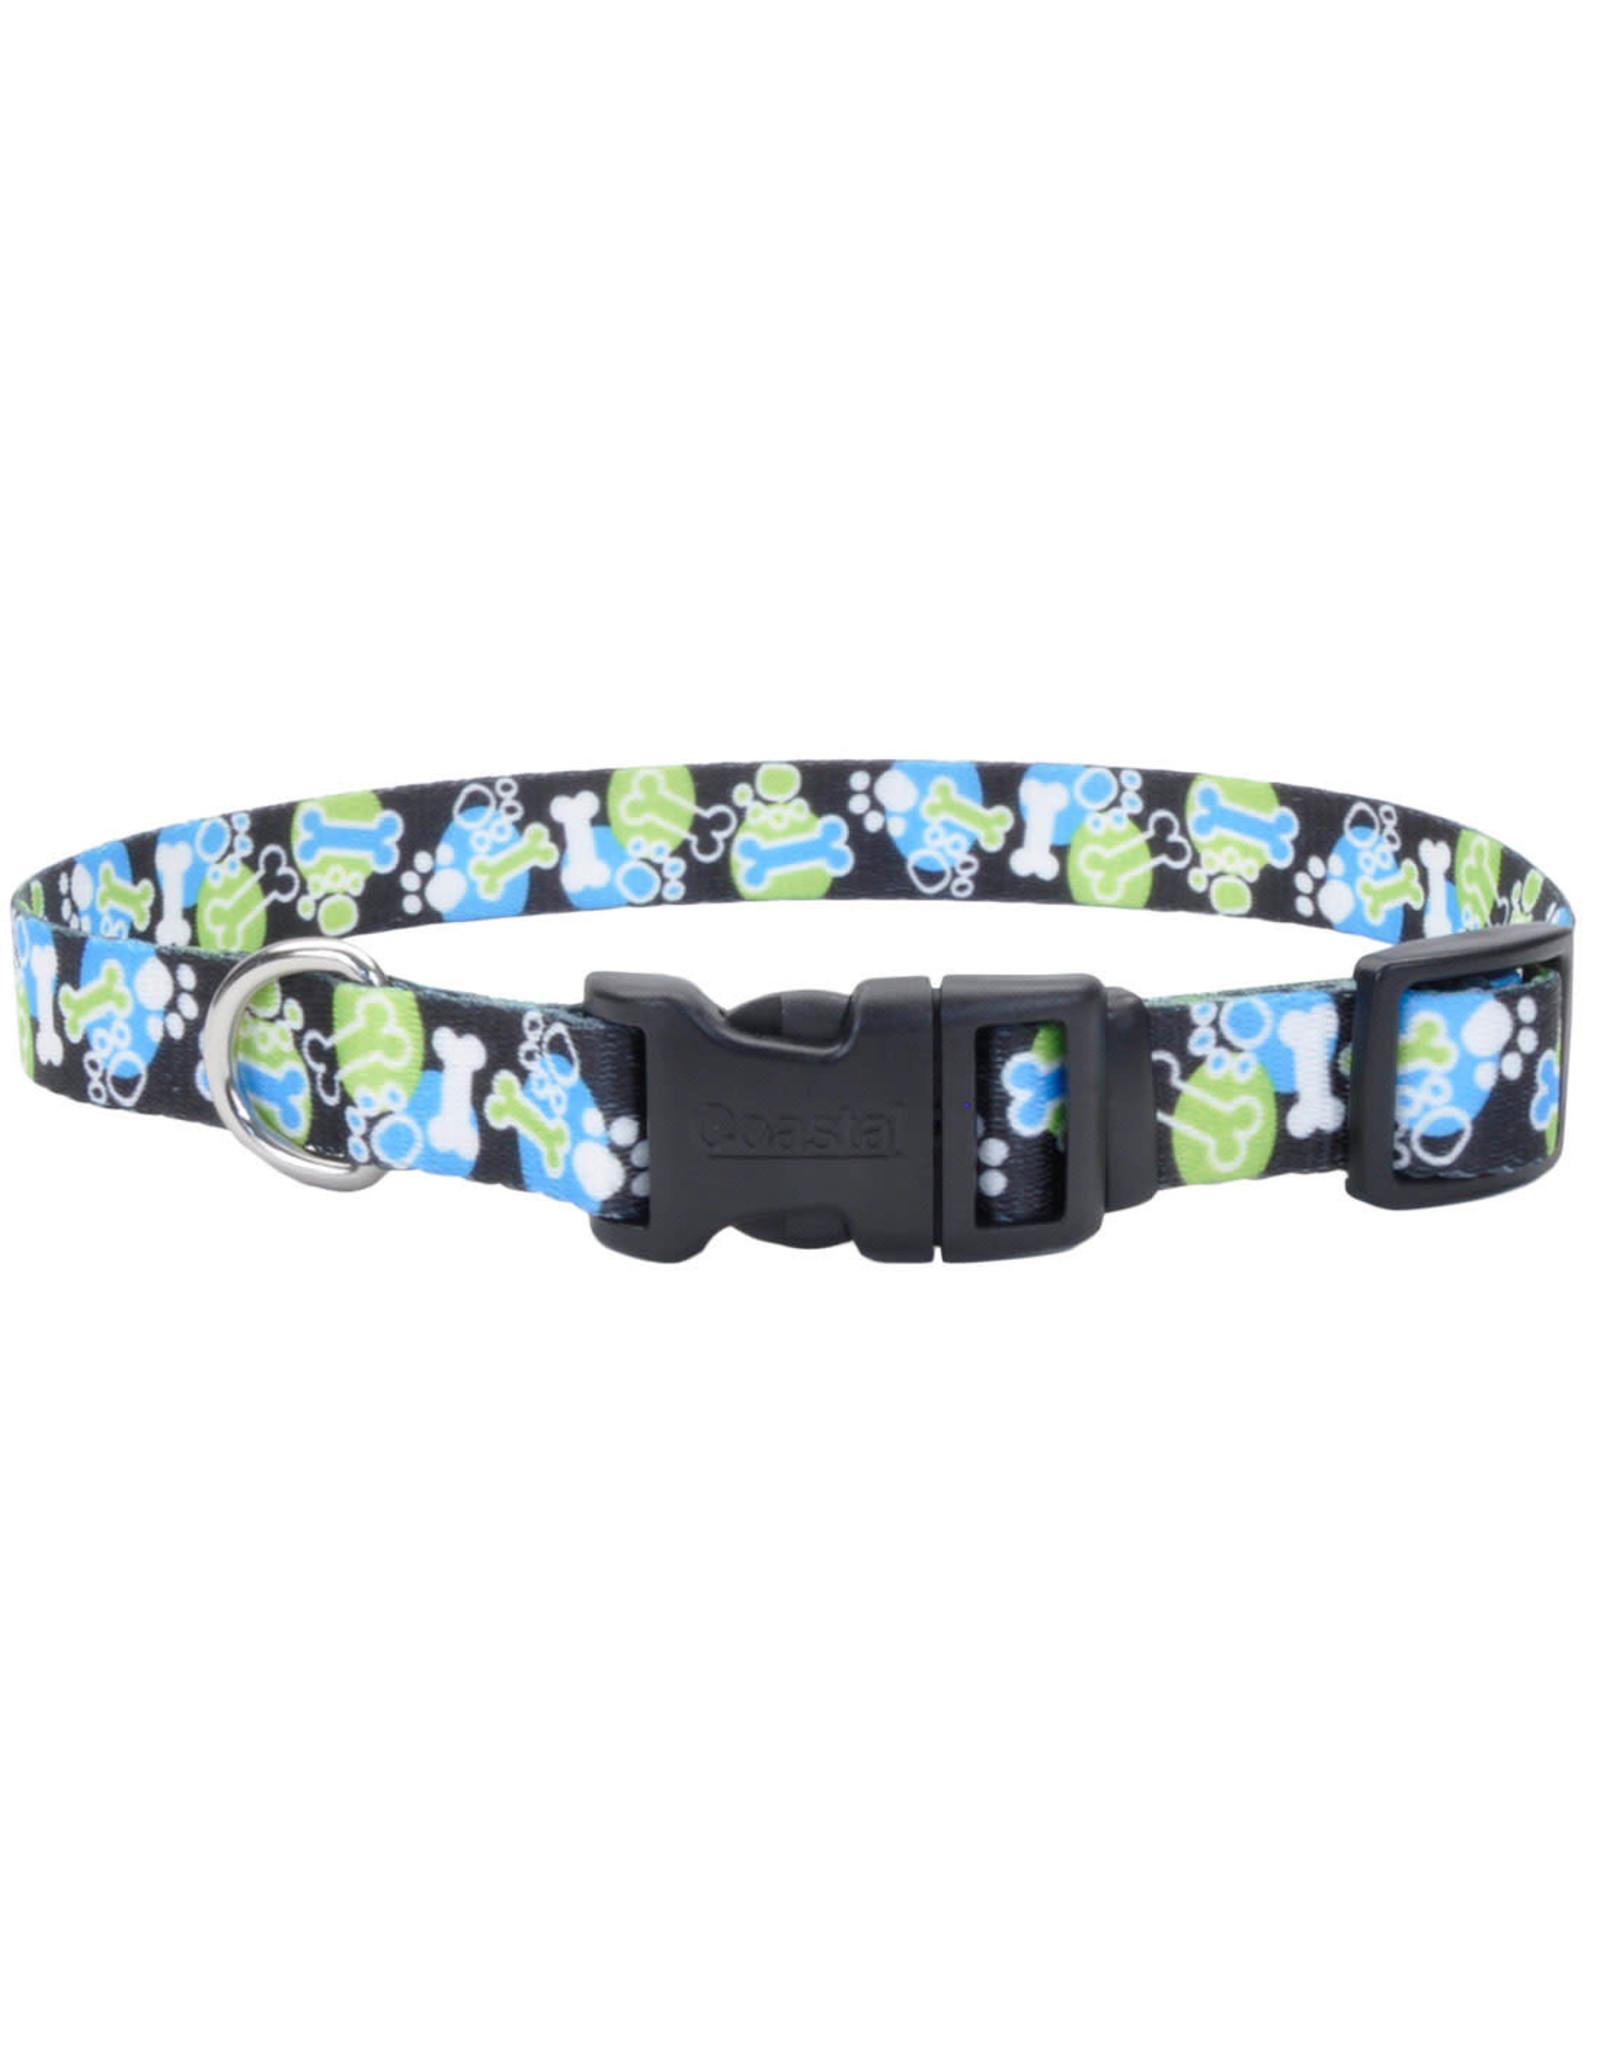 Coastal Pet Products Coastal Styles Adjustable Dog Collar